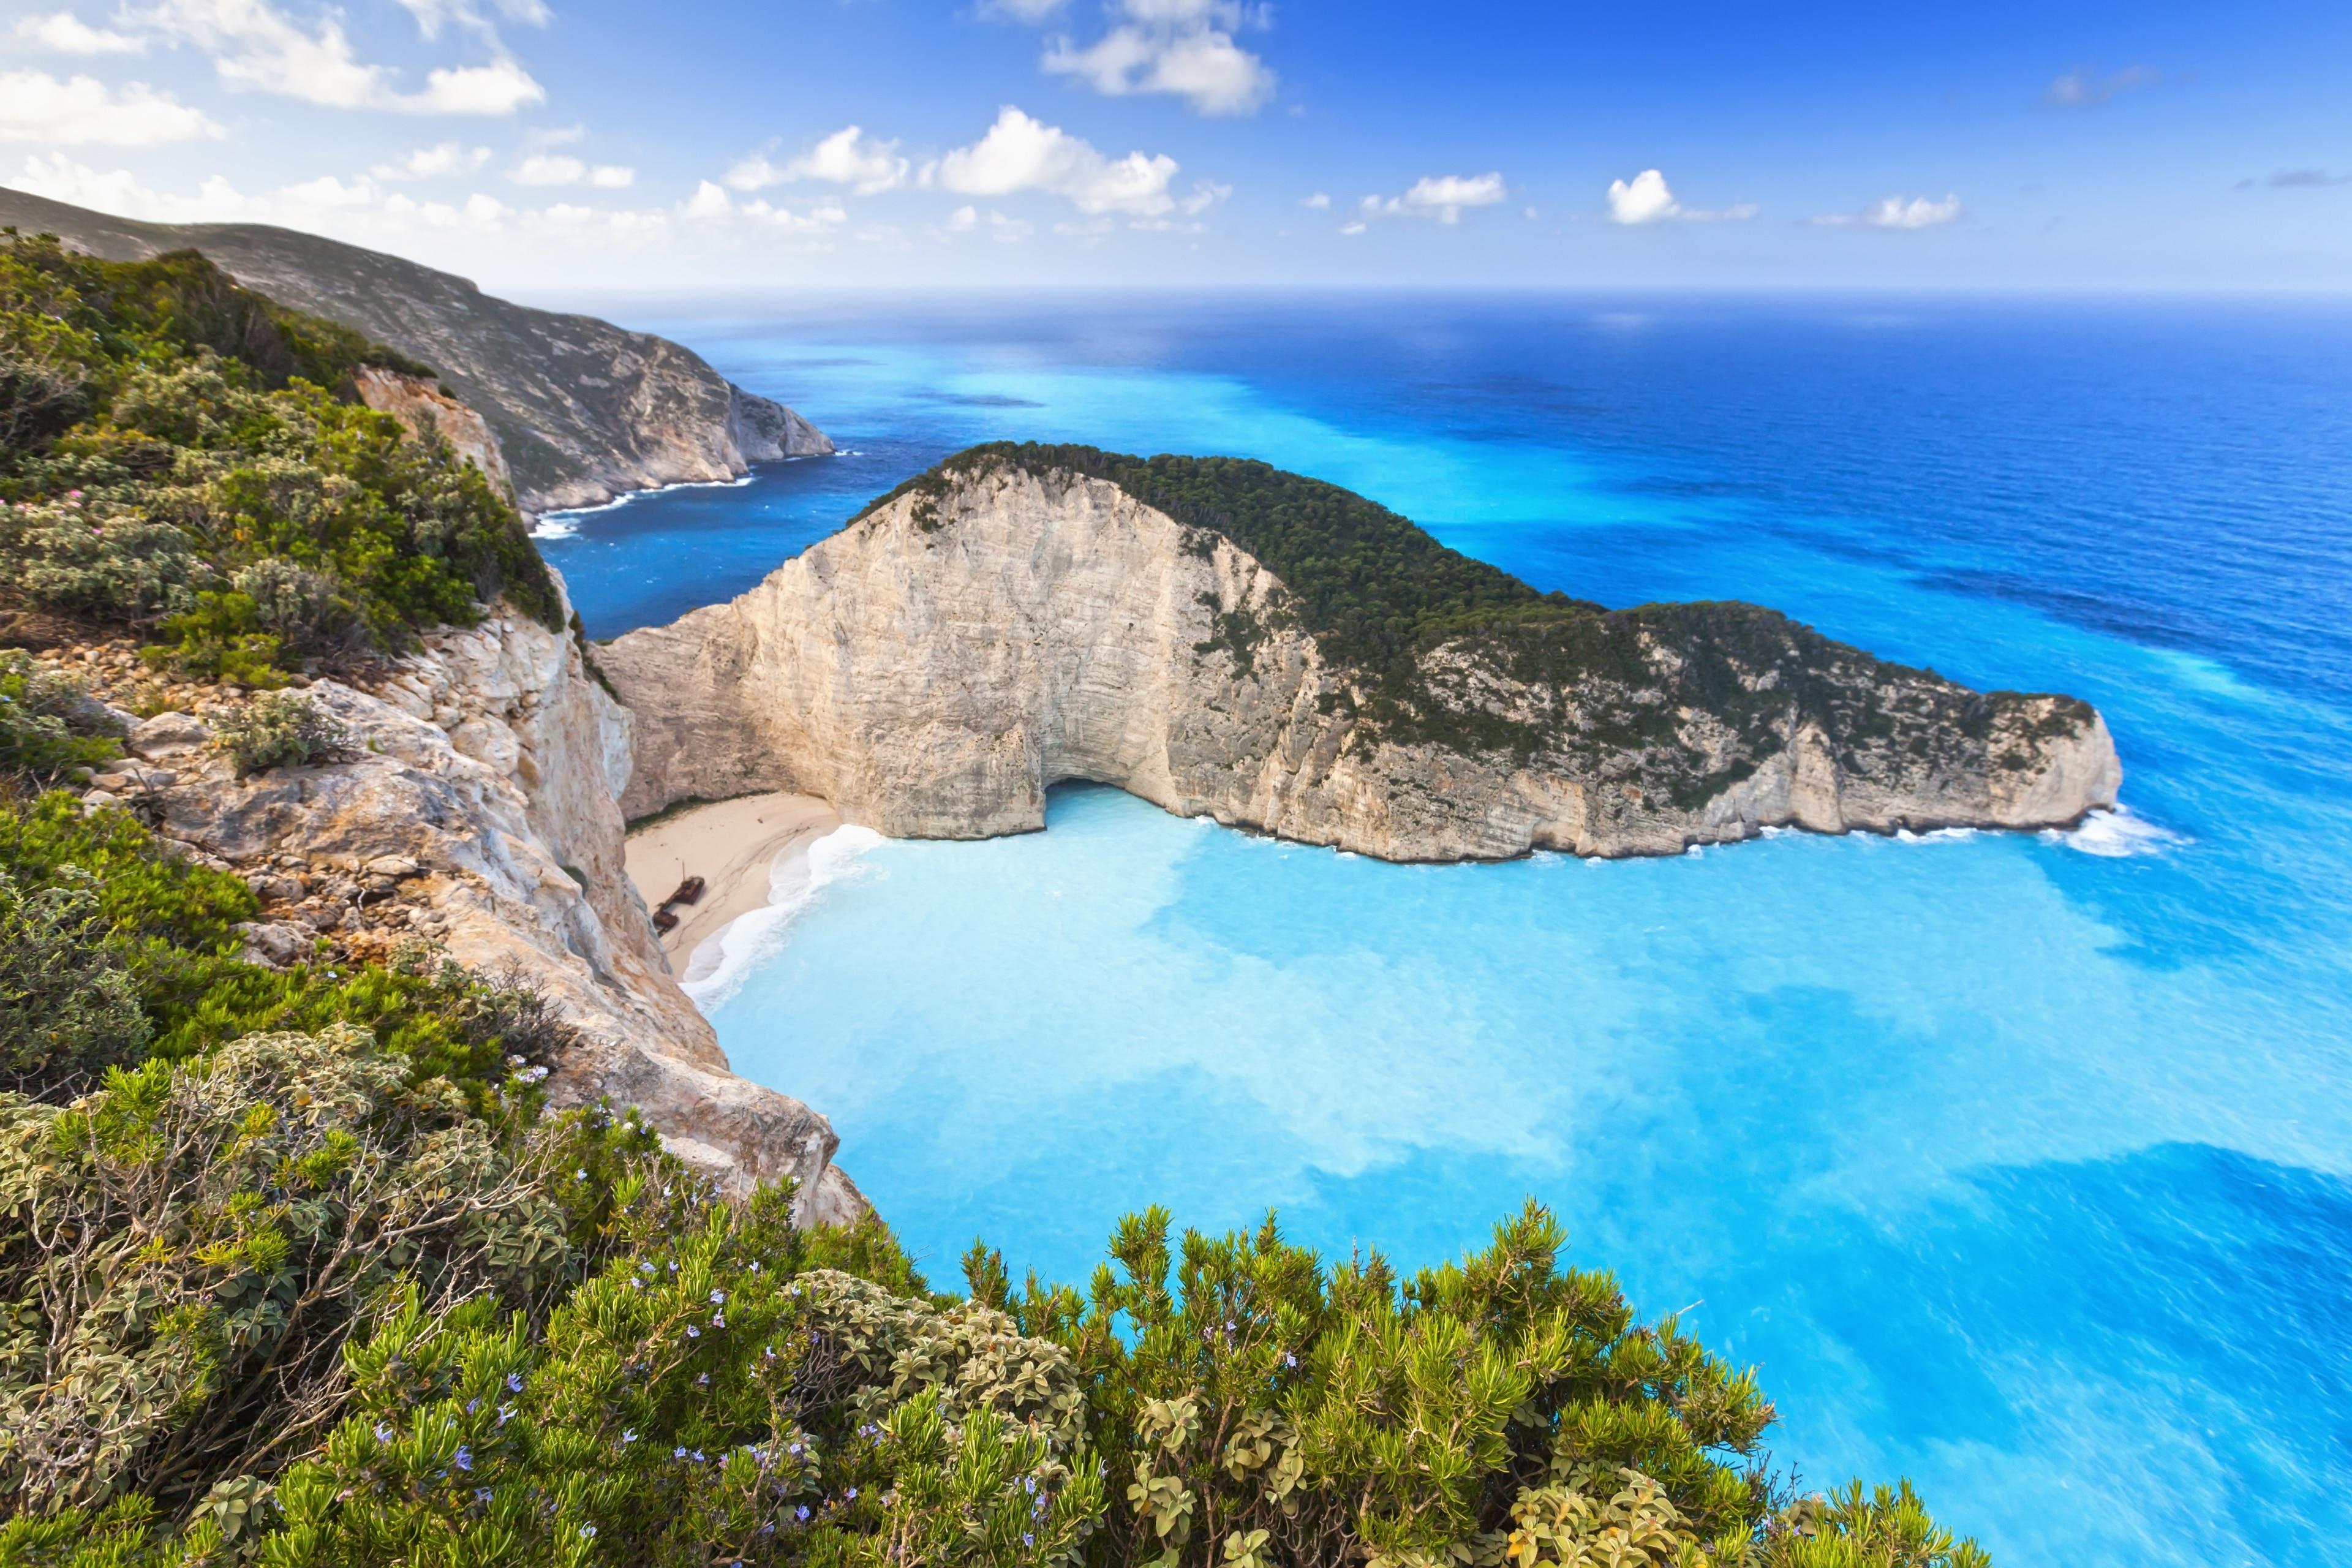 Elation, Zakynthos, Ionian Islands Region, Greece